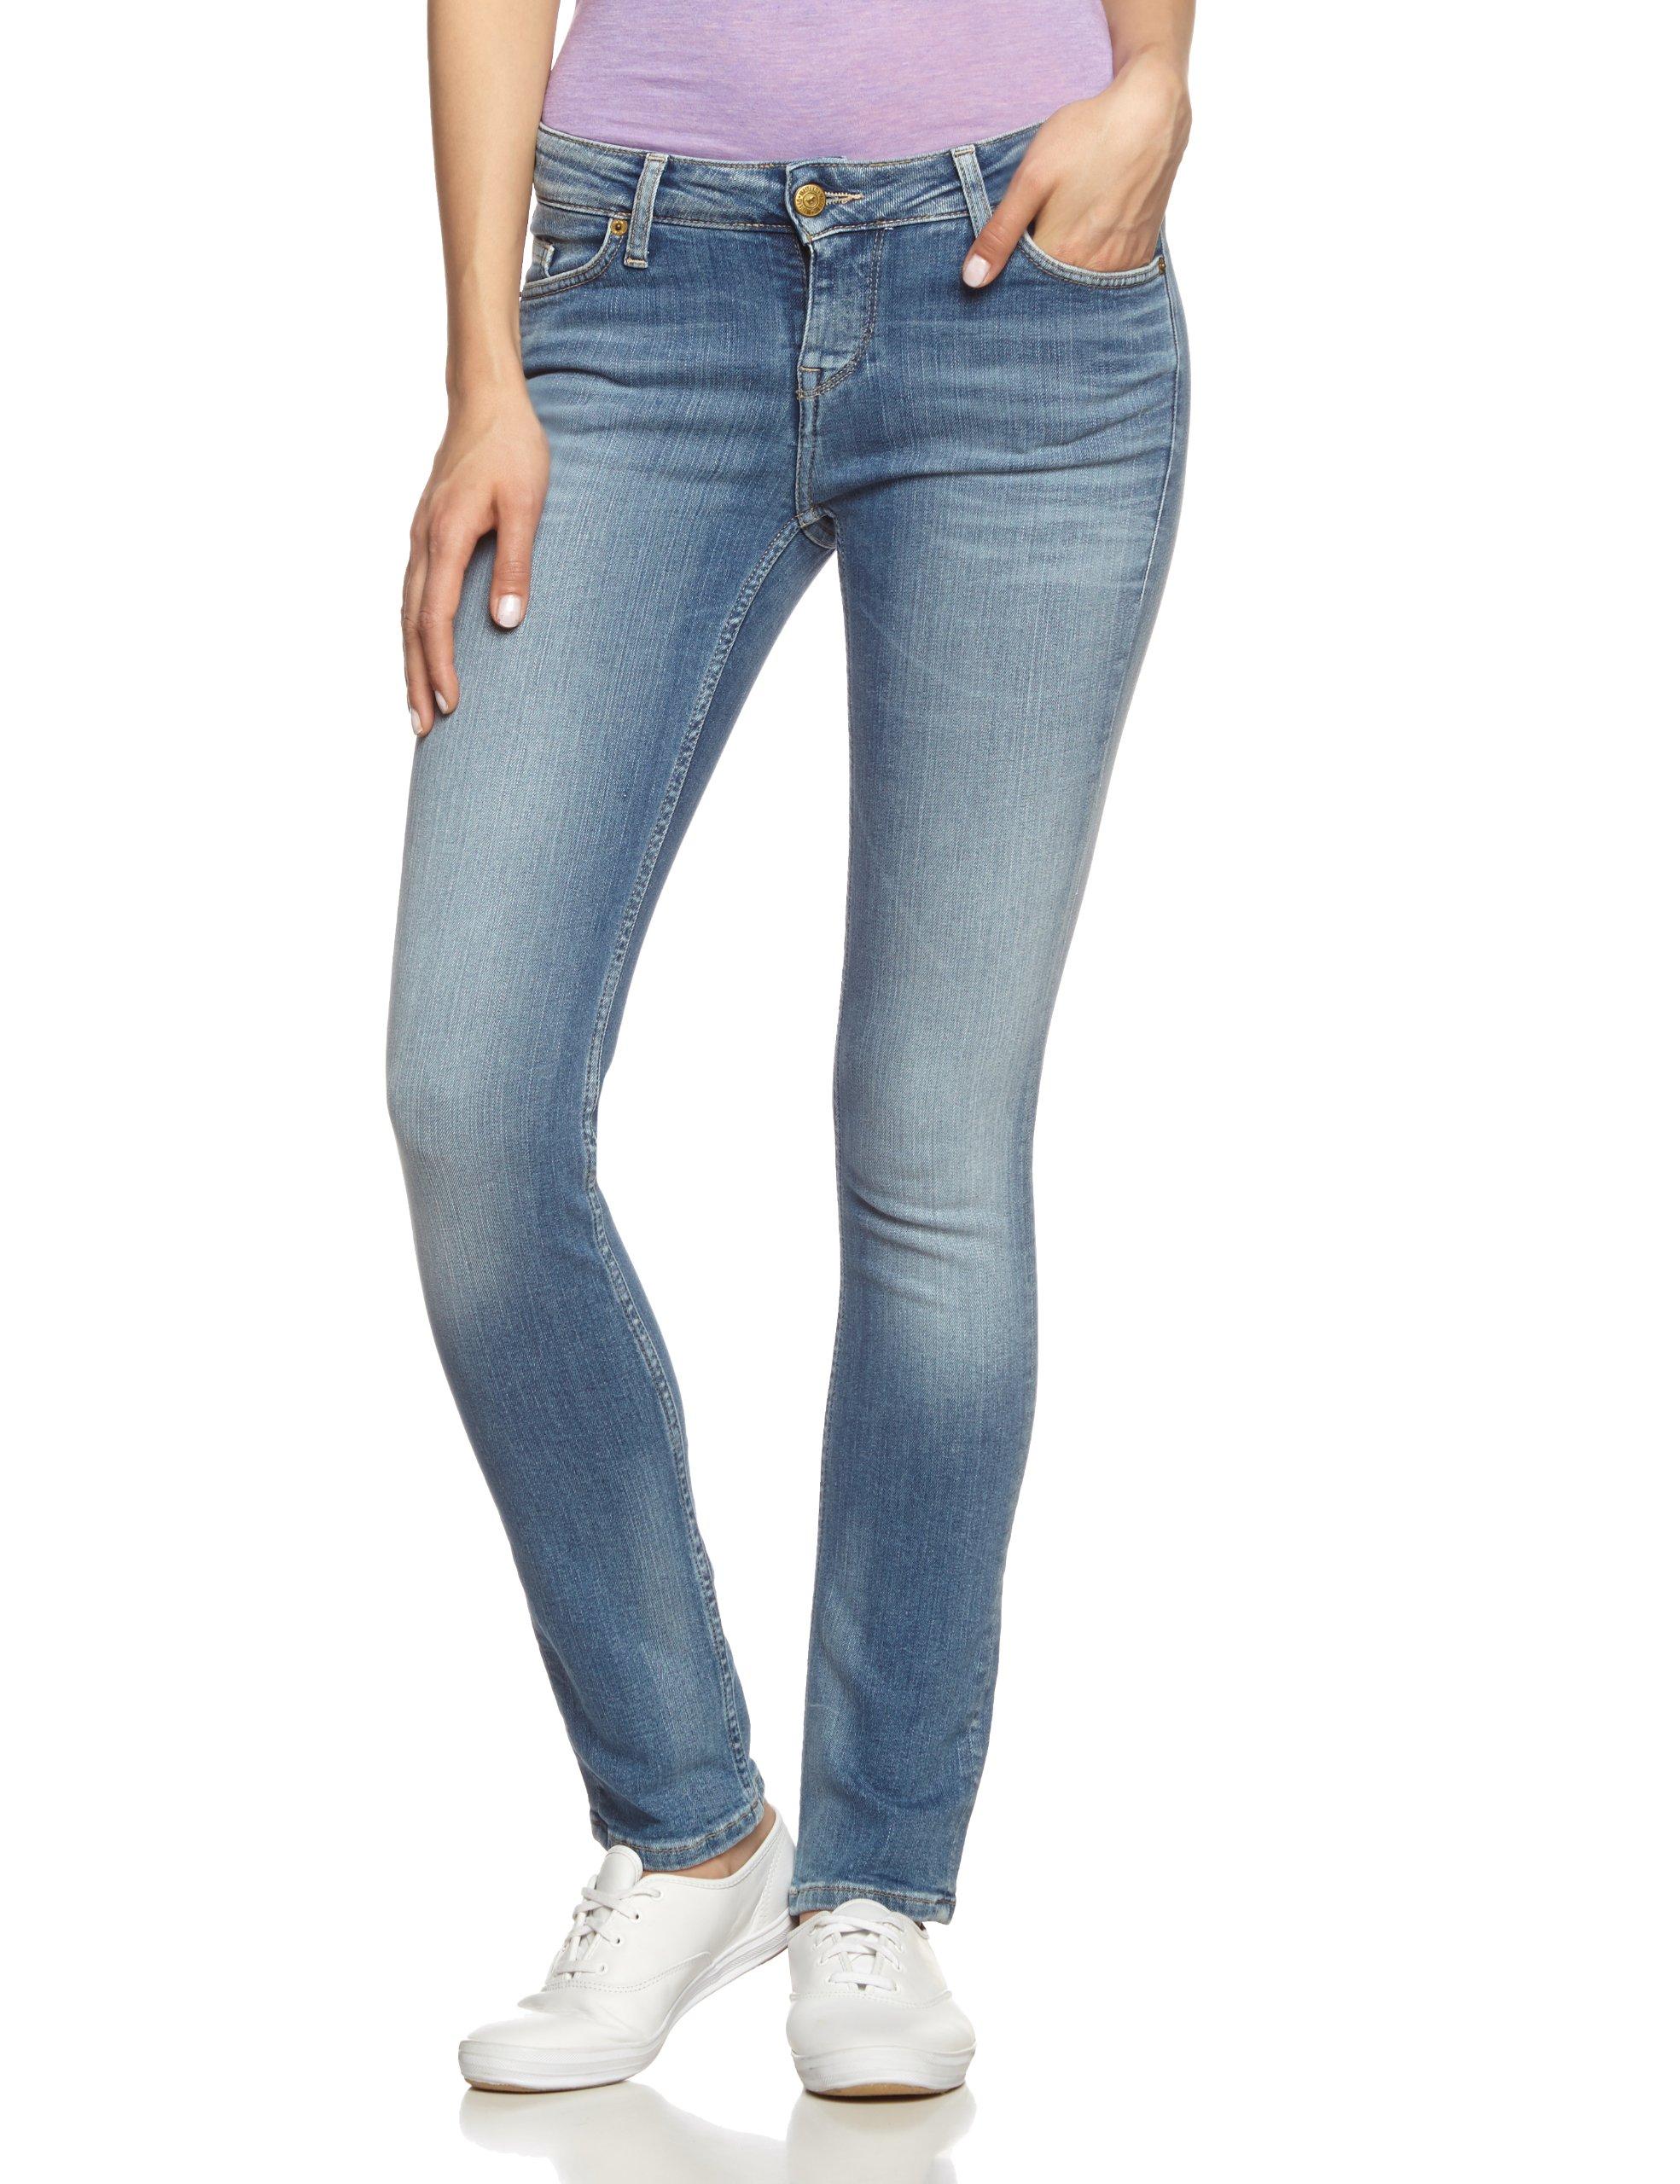 512Fr30w Mustang FemmeBleu 32 Fabricant 32ltaille 30 Blaubrushed Jeans Slim Bleached RjA53L4q